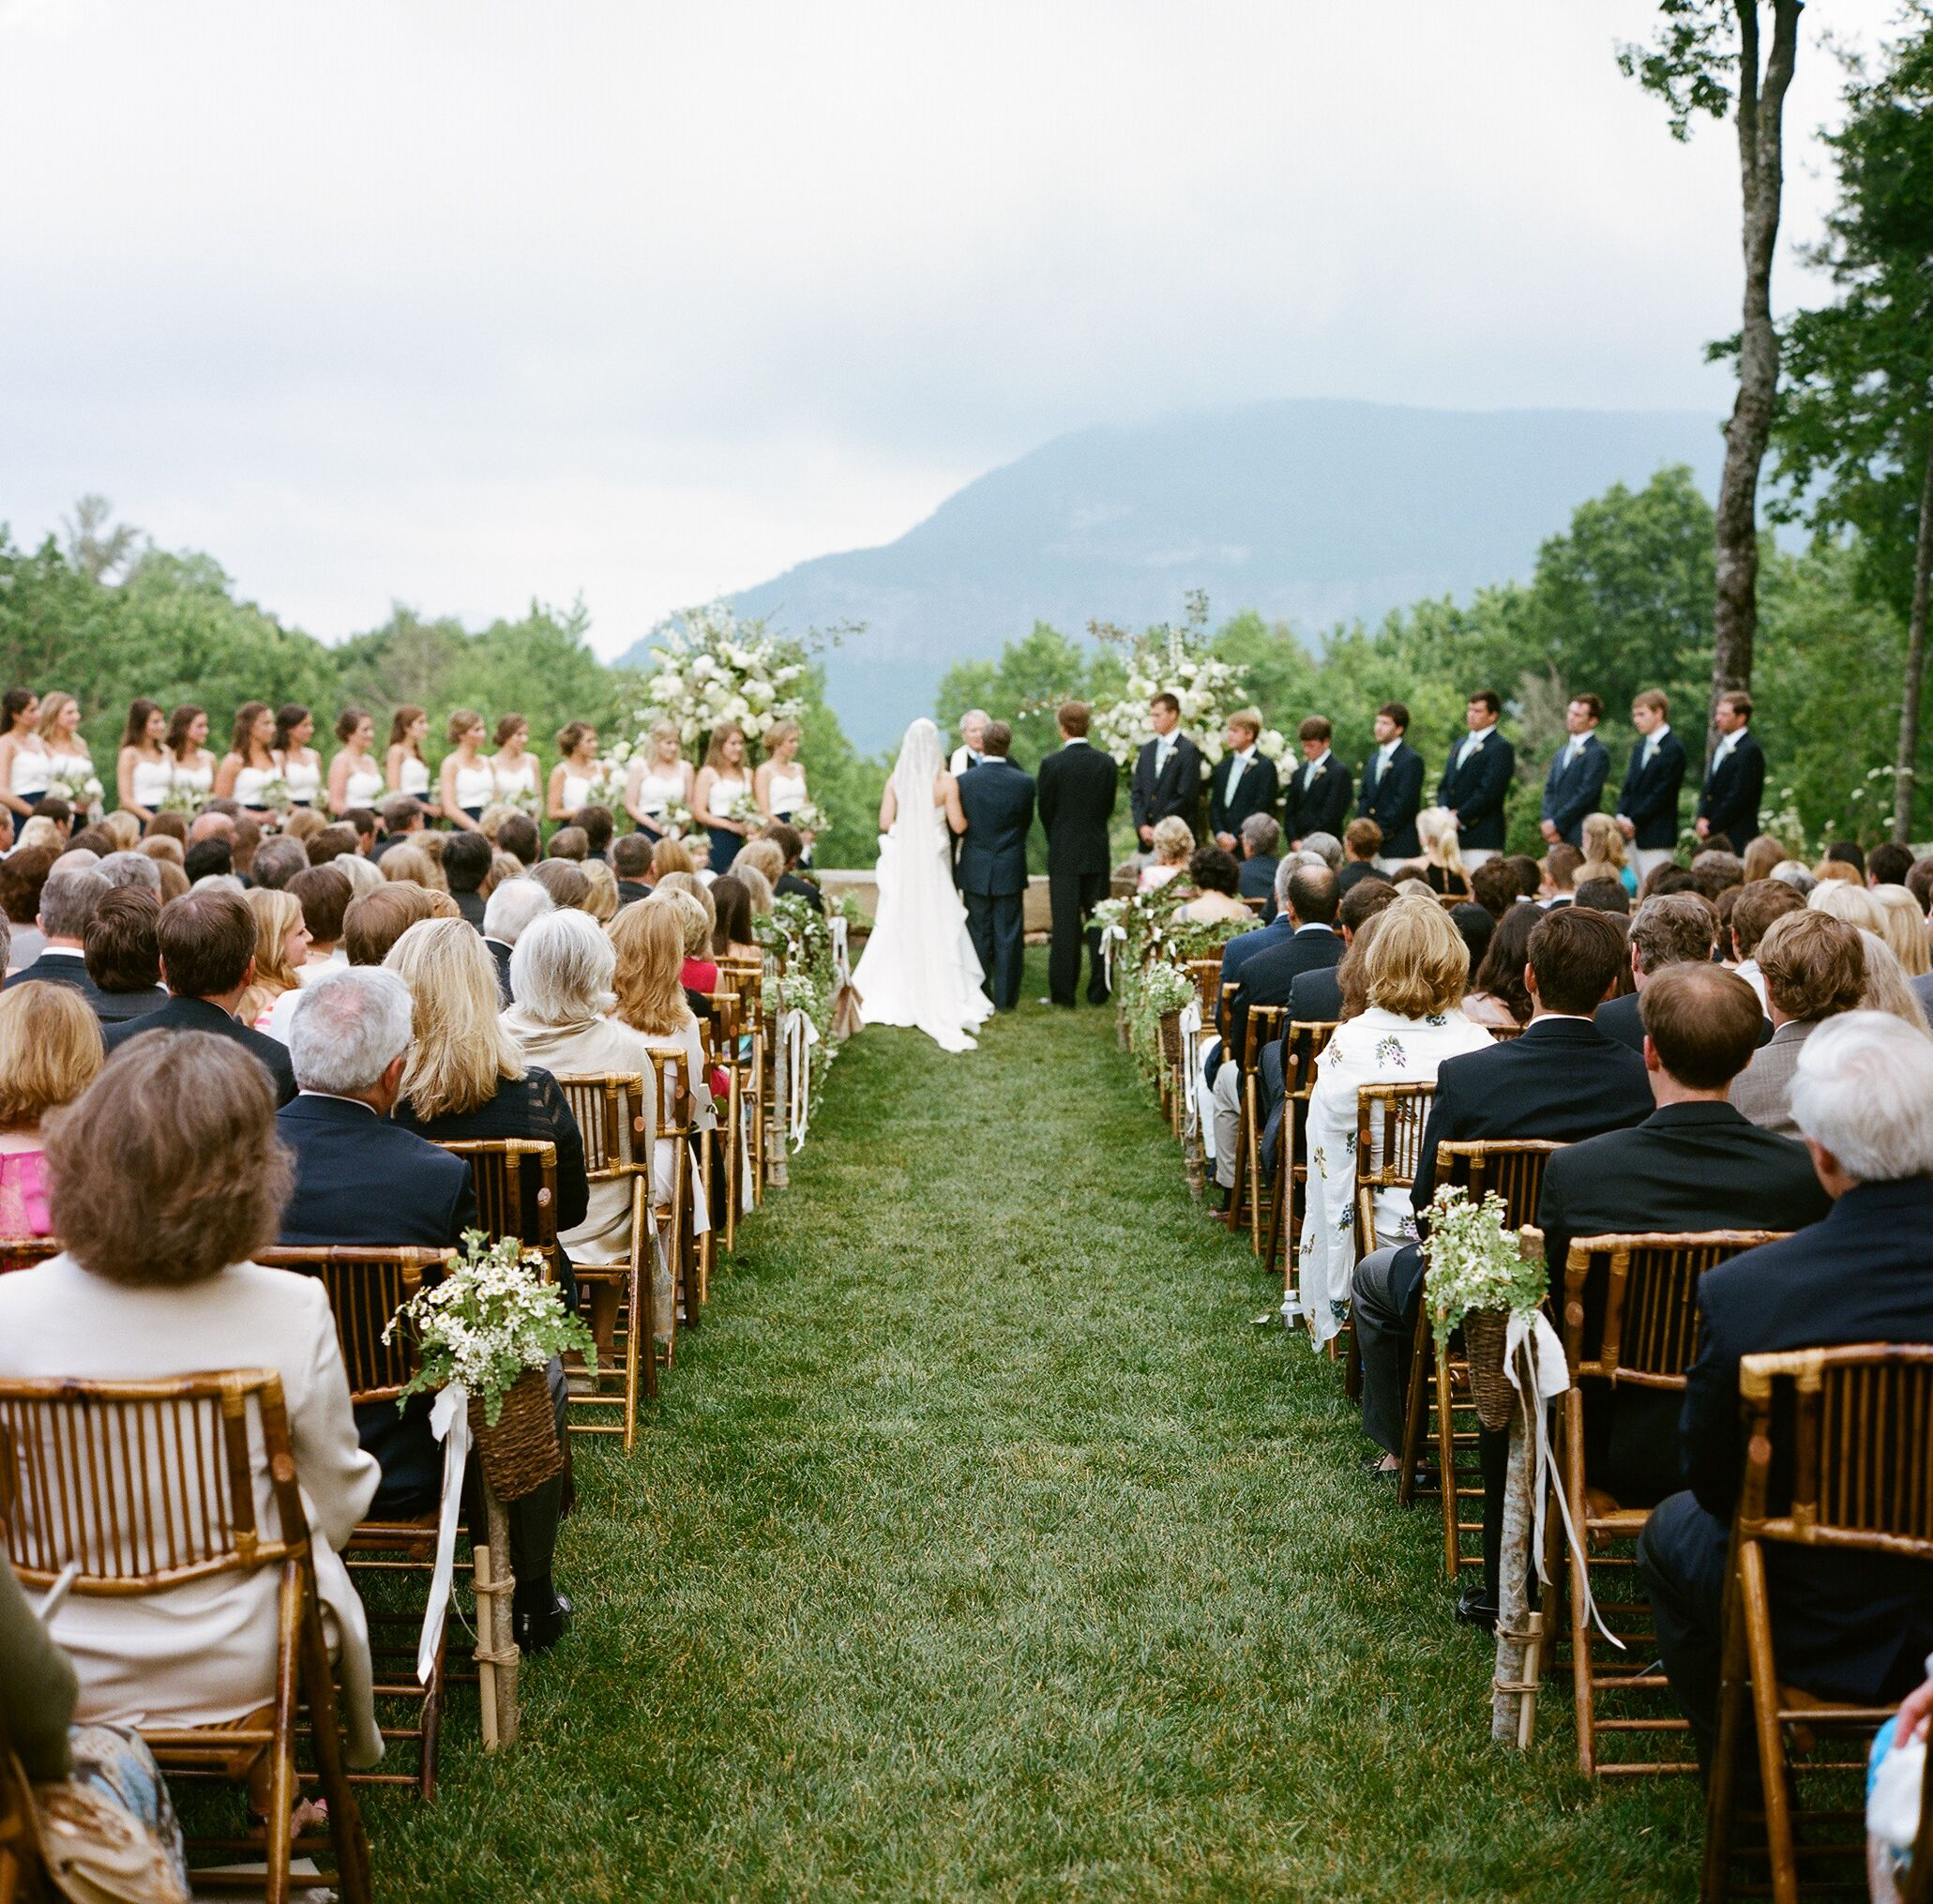 Mountain Wedding Ceremony: Whiteside Mountain Backyard Wedding Ceremony